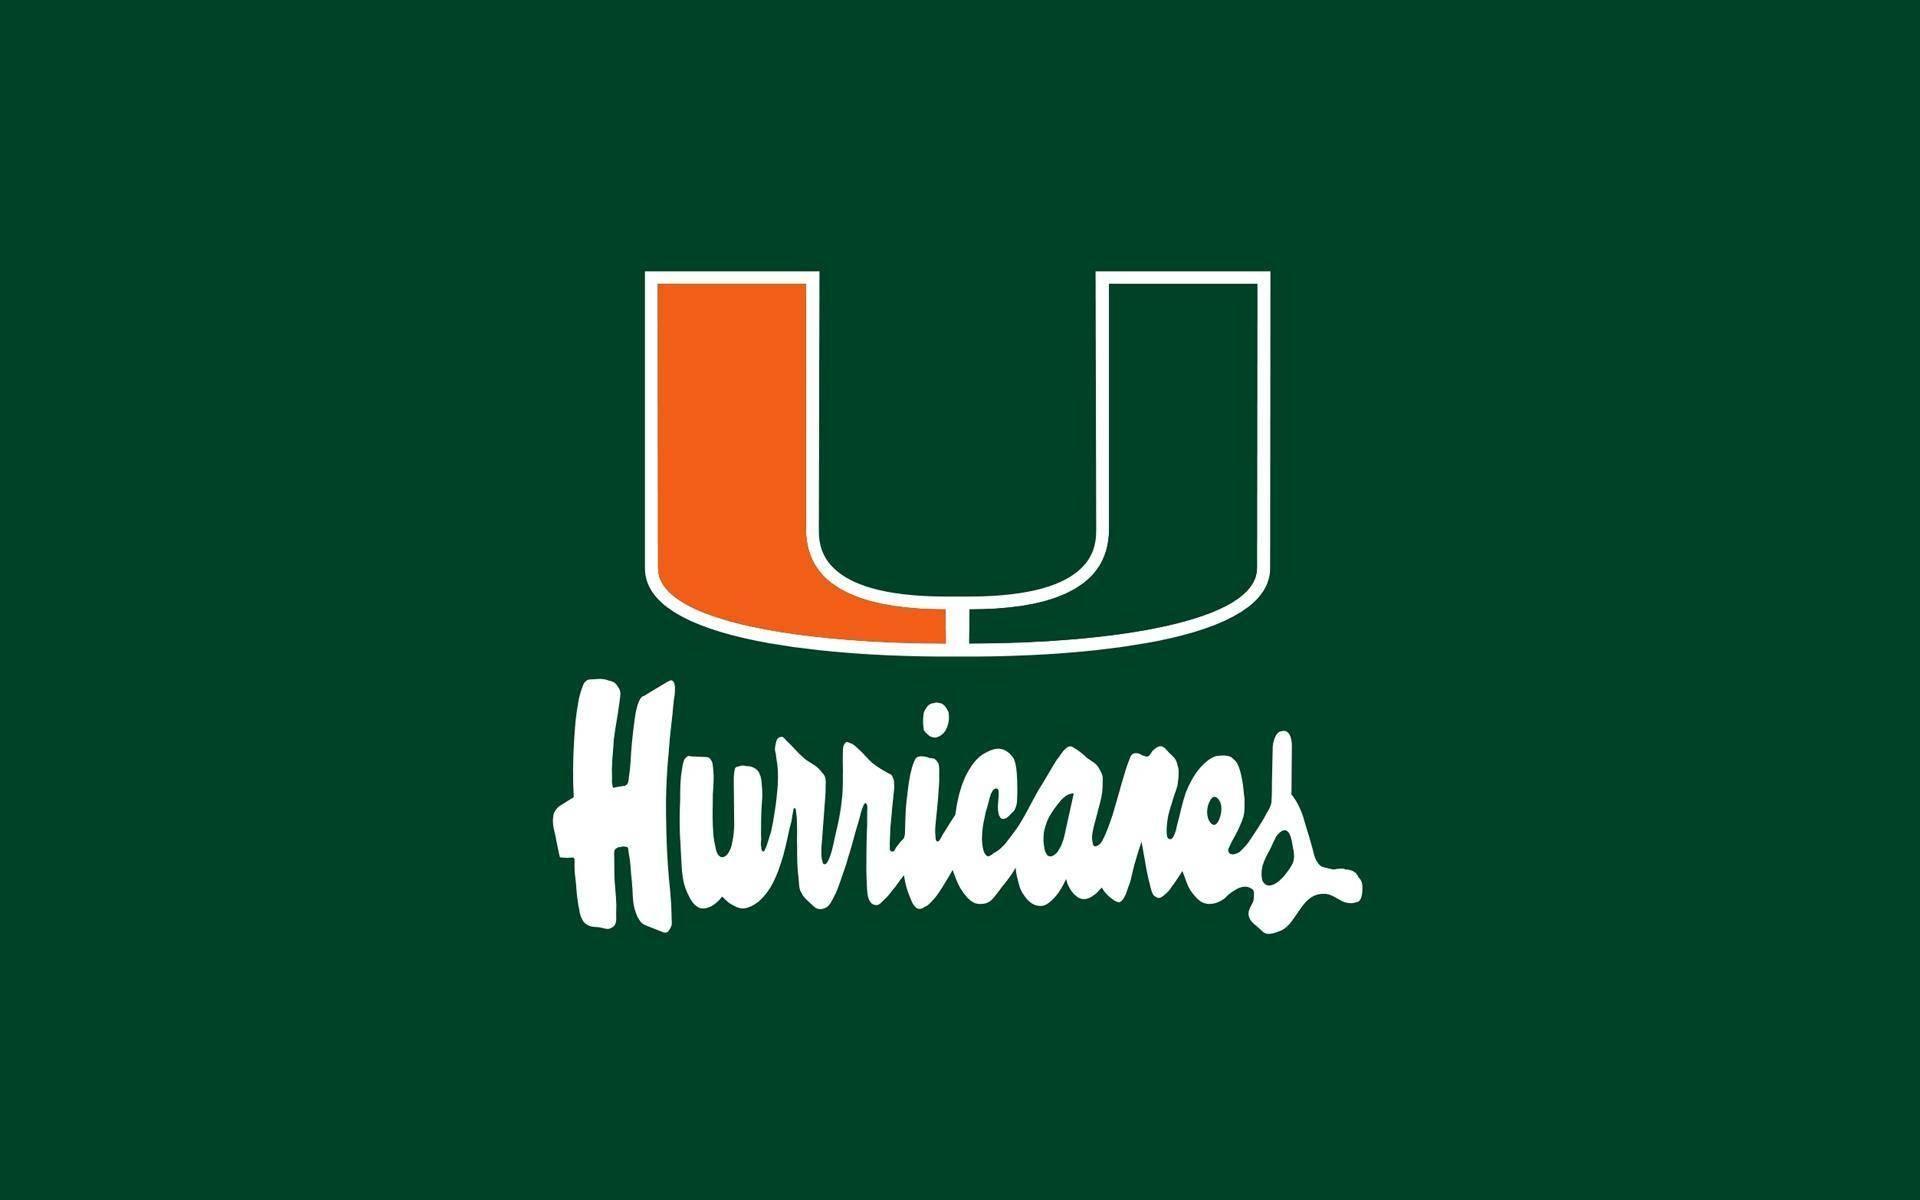 Miami Hurricanes Miami Hurricanes Miami Hurricanes Wallpaper Hurricane